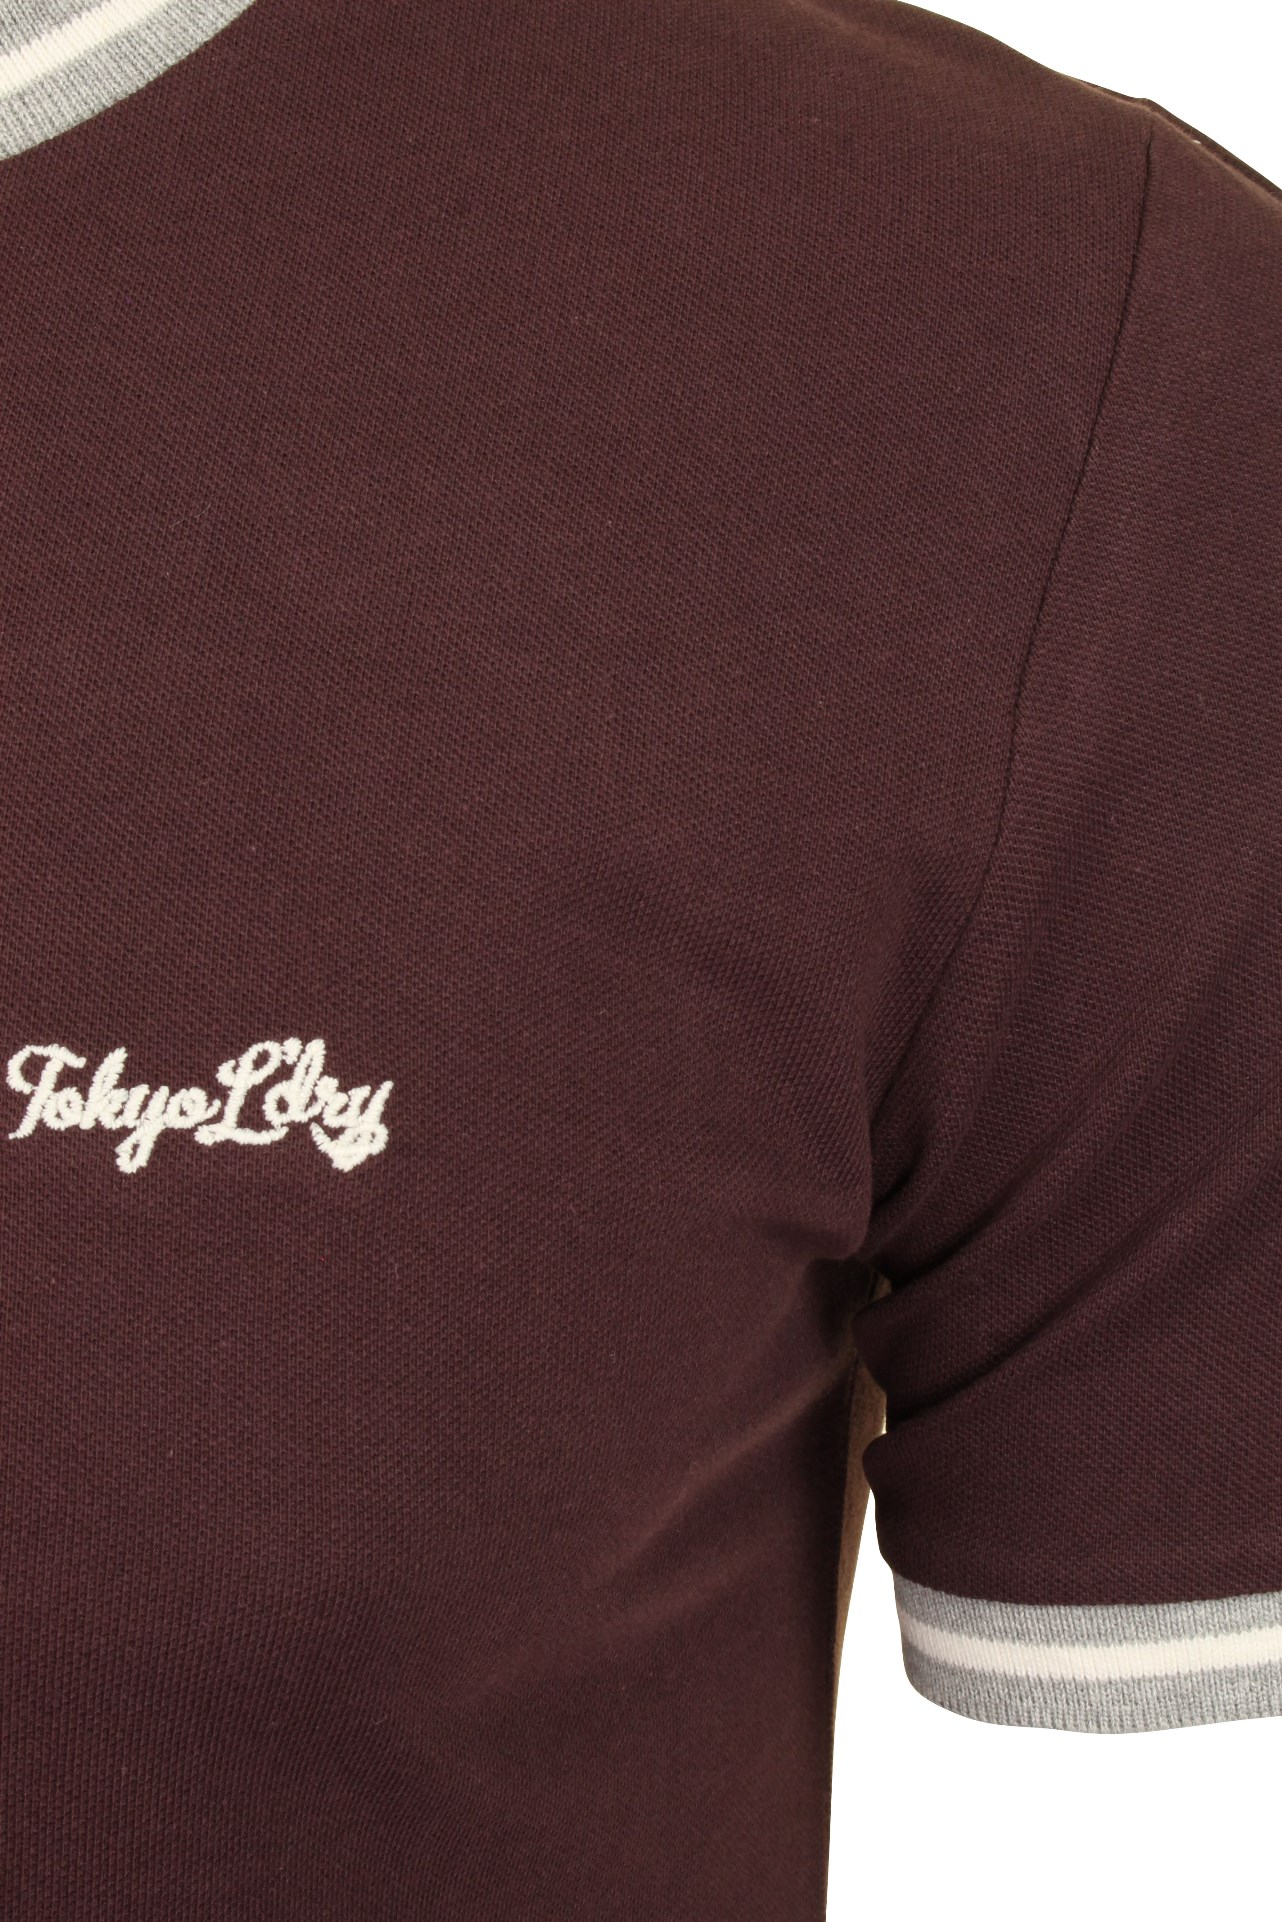 Tokyo-Laundry-Mens-Pique-Crew-Neck-T-Shirt-039-Wentworth-039 thumbnail 13